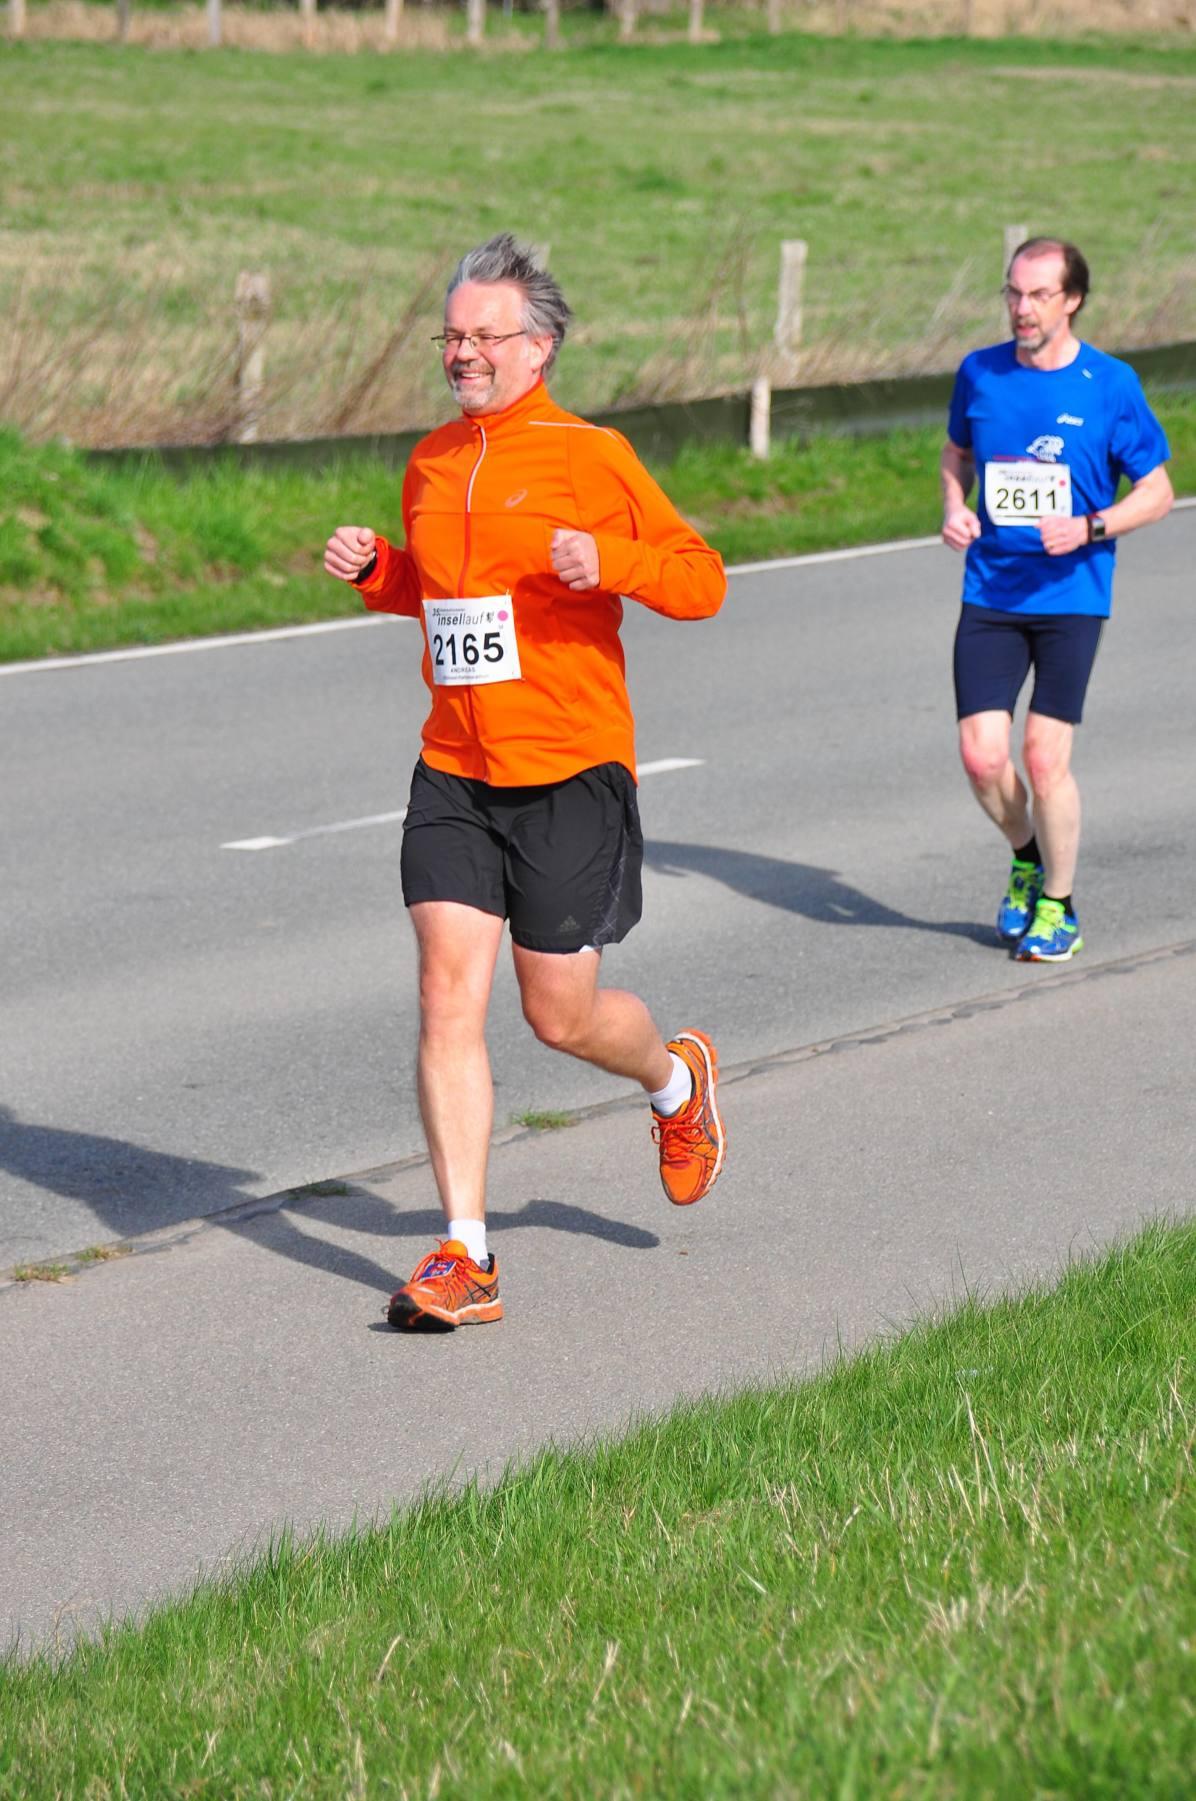 meine-sportfotos.de Foto #351807 (c) Karsten Krohn